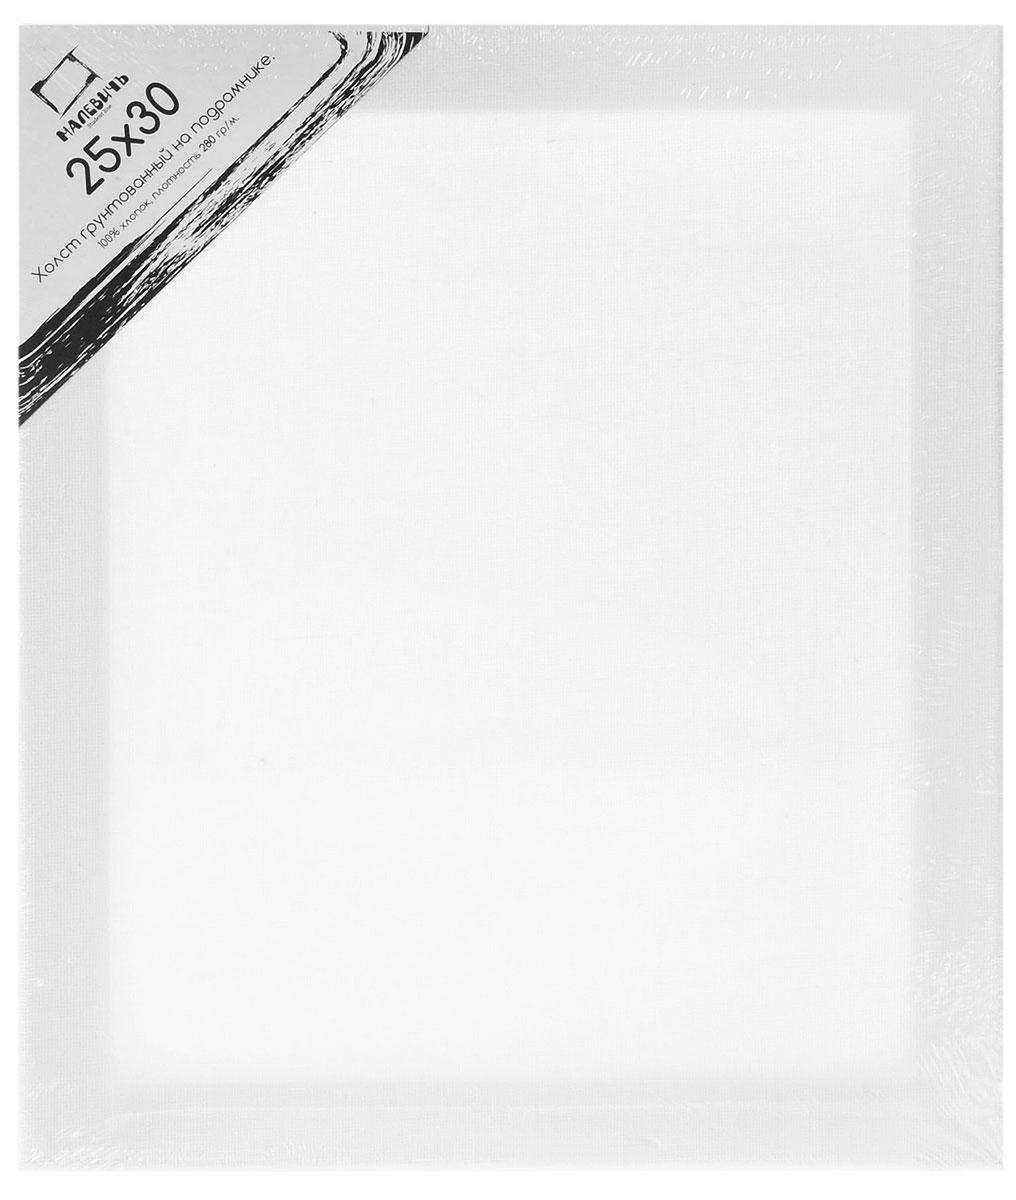 Малевичъ Холст на подрамнике 25 см x 30 см 280 г/м2